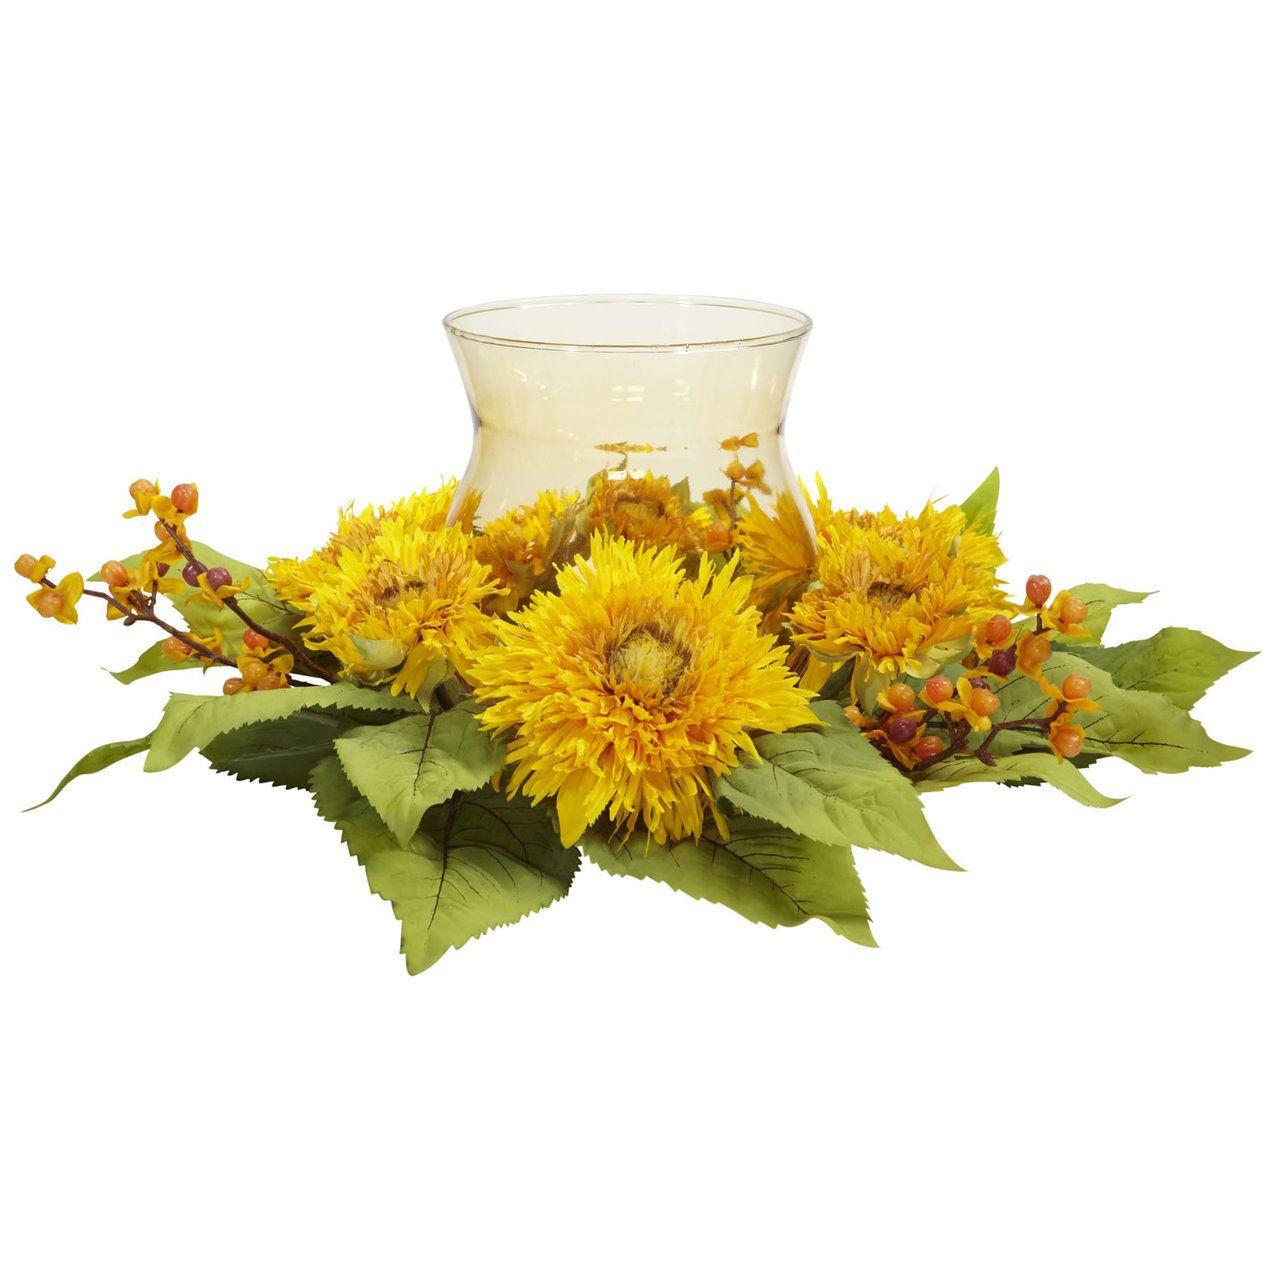 BlueBerry Creek Gift Baskets - Golden Sunflower Decorator Silk Flower Arrangement Candelabrum Centerpiece, $44.95 (http://www.blueberrycreekgiftbaskets.com/golden-sunflower-decorator-silk-flower-arrangement-candelabrum-centerpiece/)